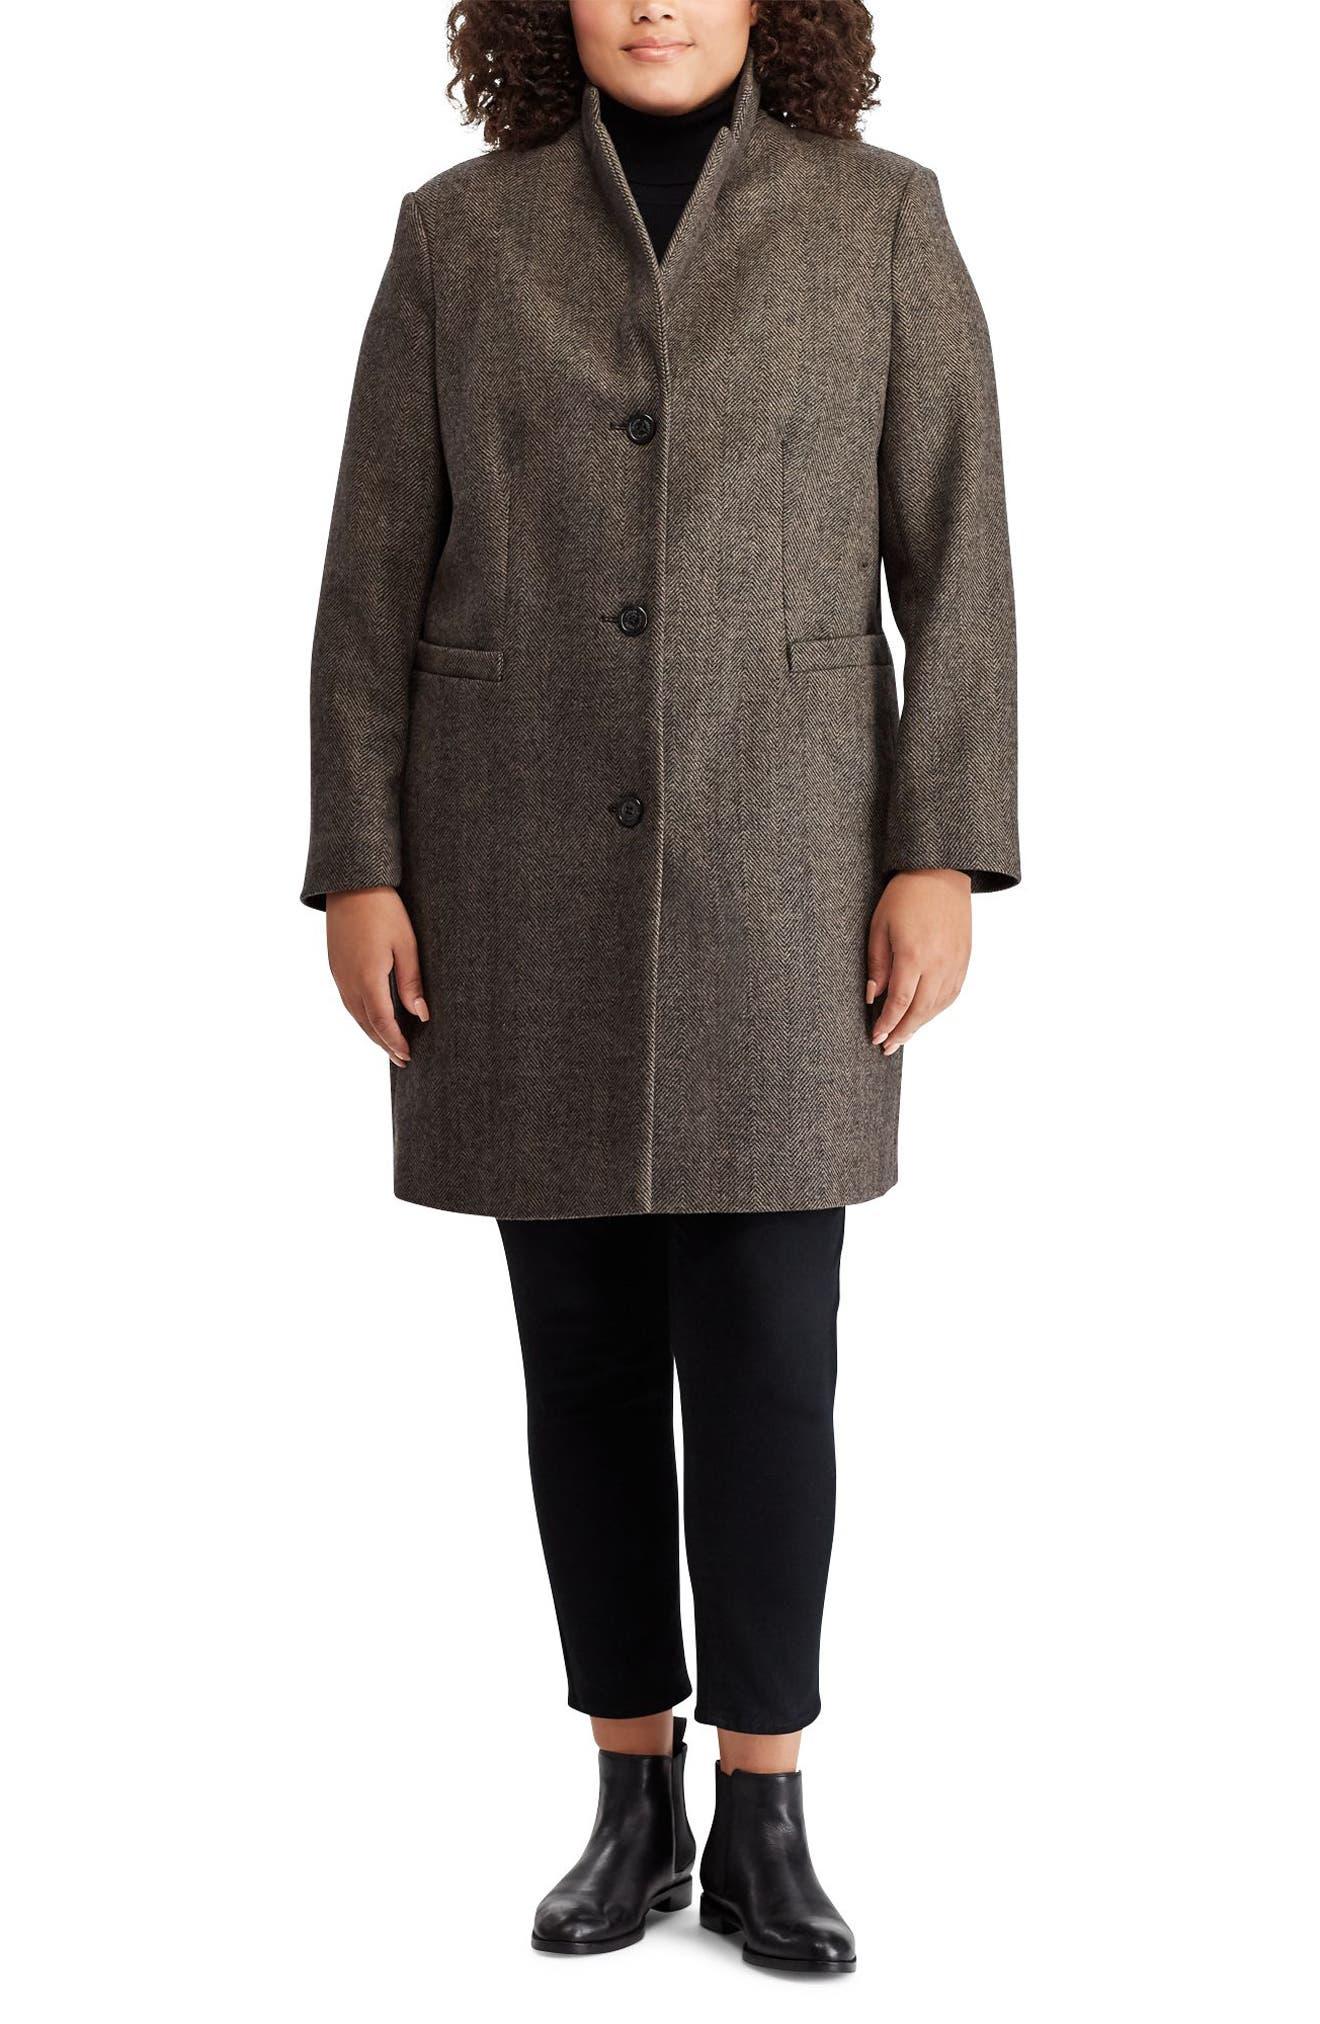 LAUREN RALPH LAUREN,                             Herringbone Wool Blend Reefer Coat,                             Alternate thumbnail 3, color,                             008